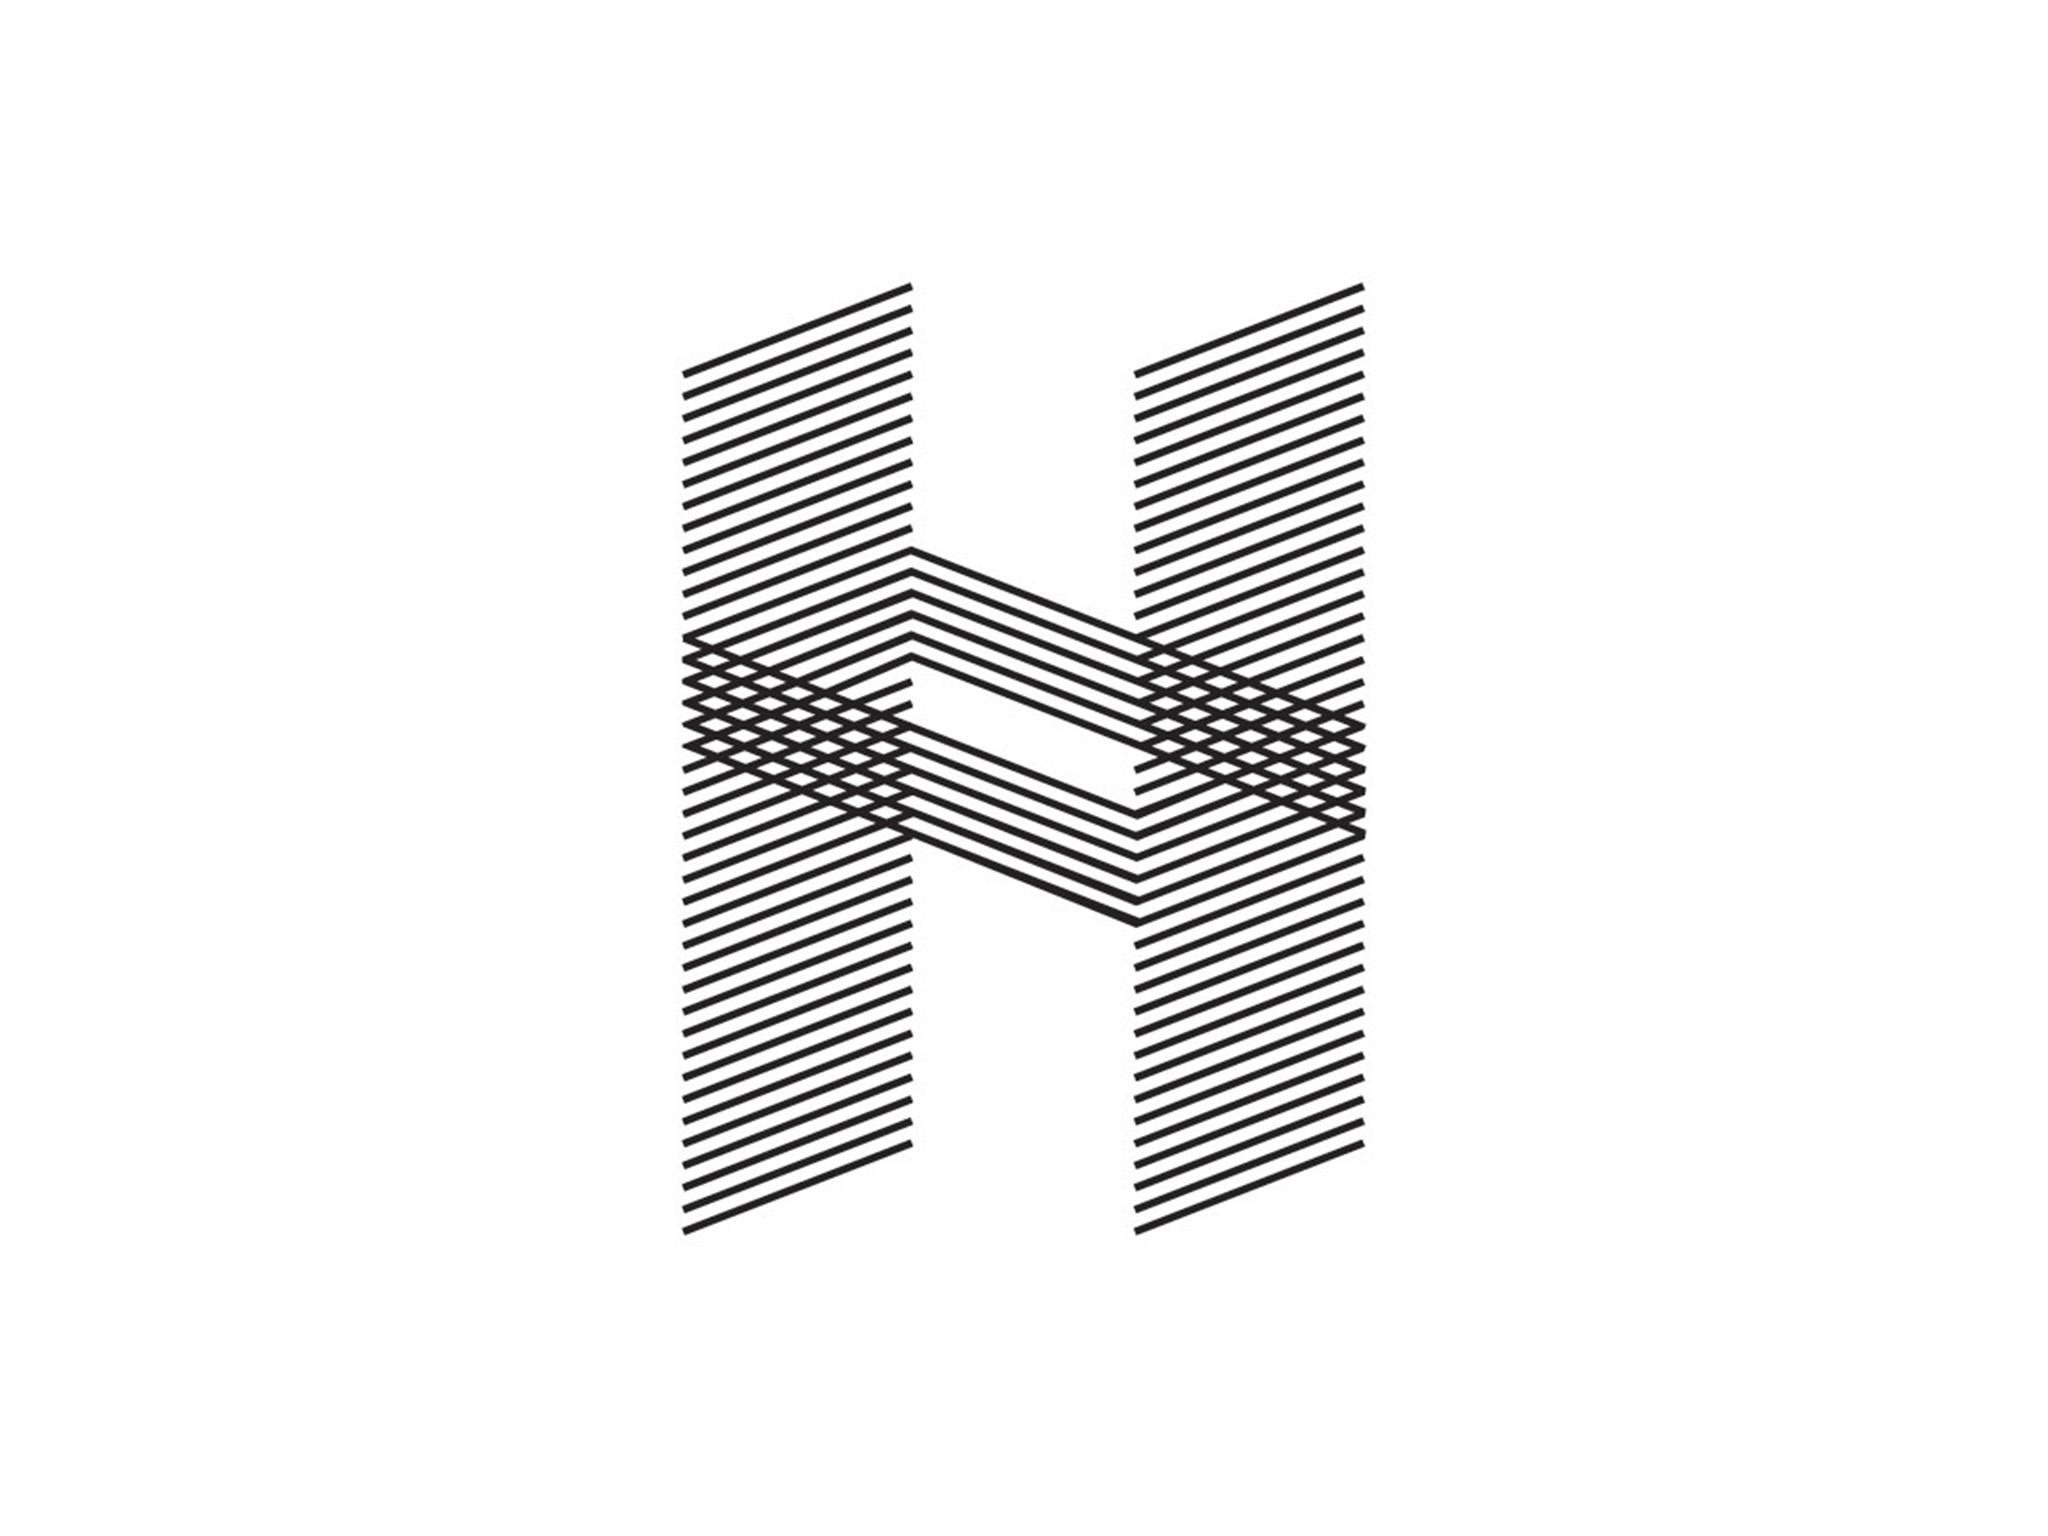 apex_letters_horizontal_large_0014_2_final_alphabet coasters-08.jpg